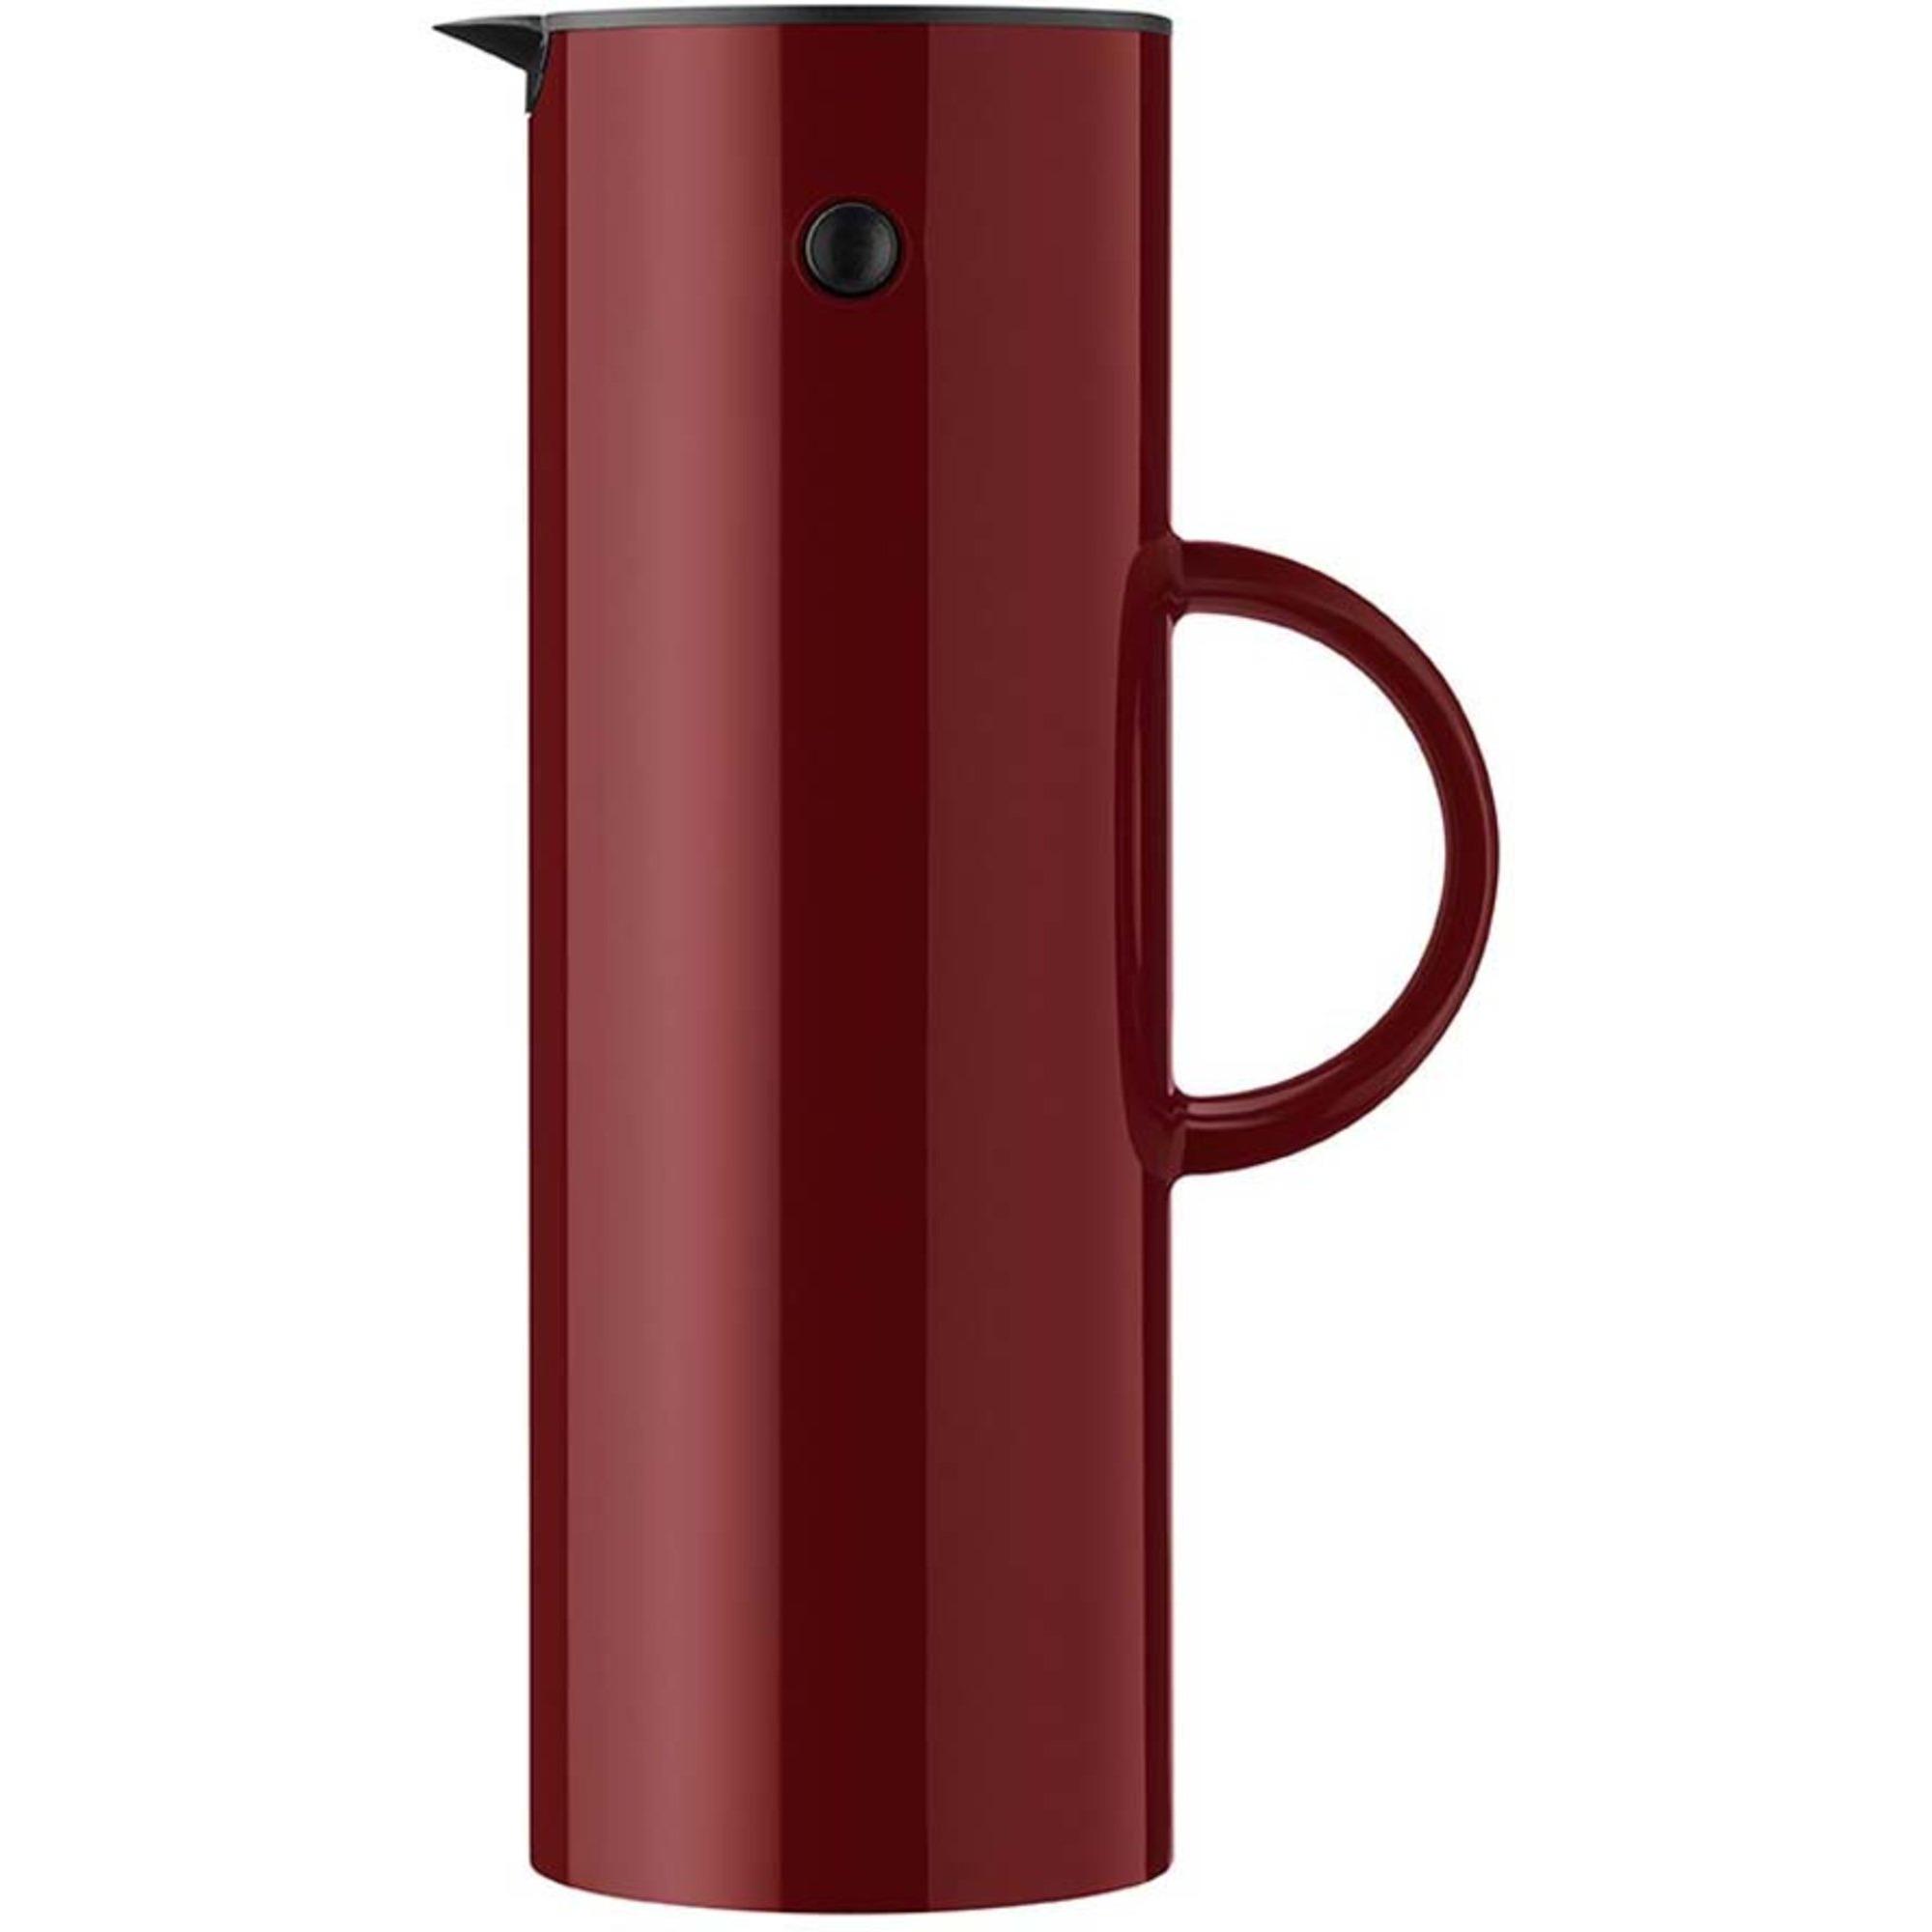 Stelton EM77 Termoskanna 1 liter Warm maroon